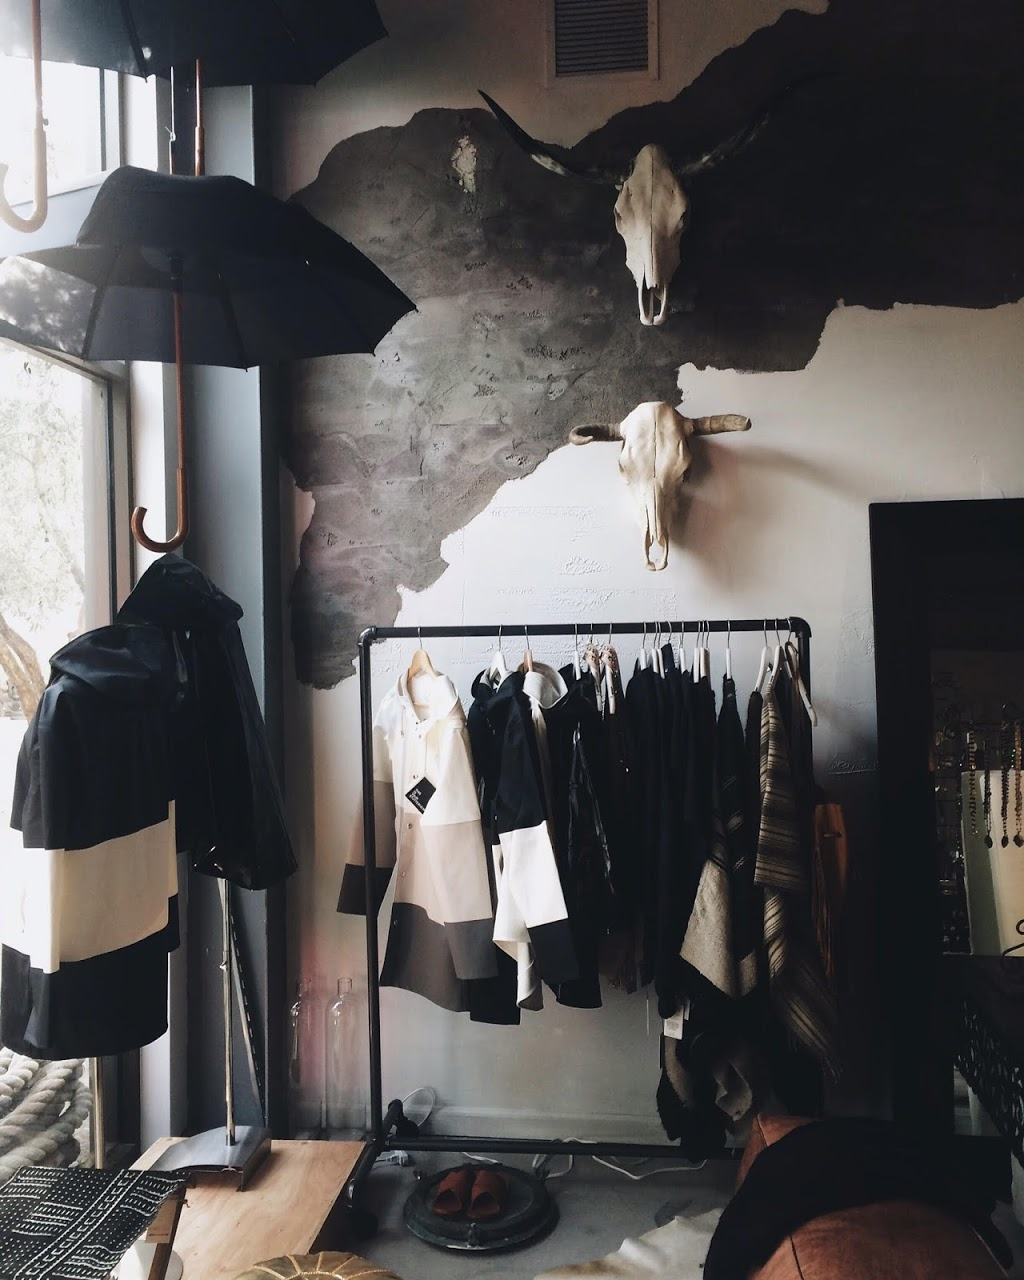 Nomad Chic - clothing store    Photo 4 of 10   Address: 23570 Arnold Dr, Sonoma, CA 95476, USA   Phone: (415) 381-9087